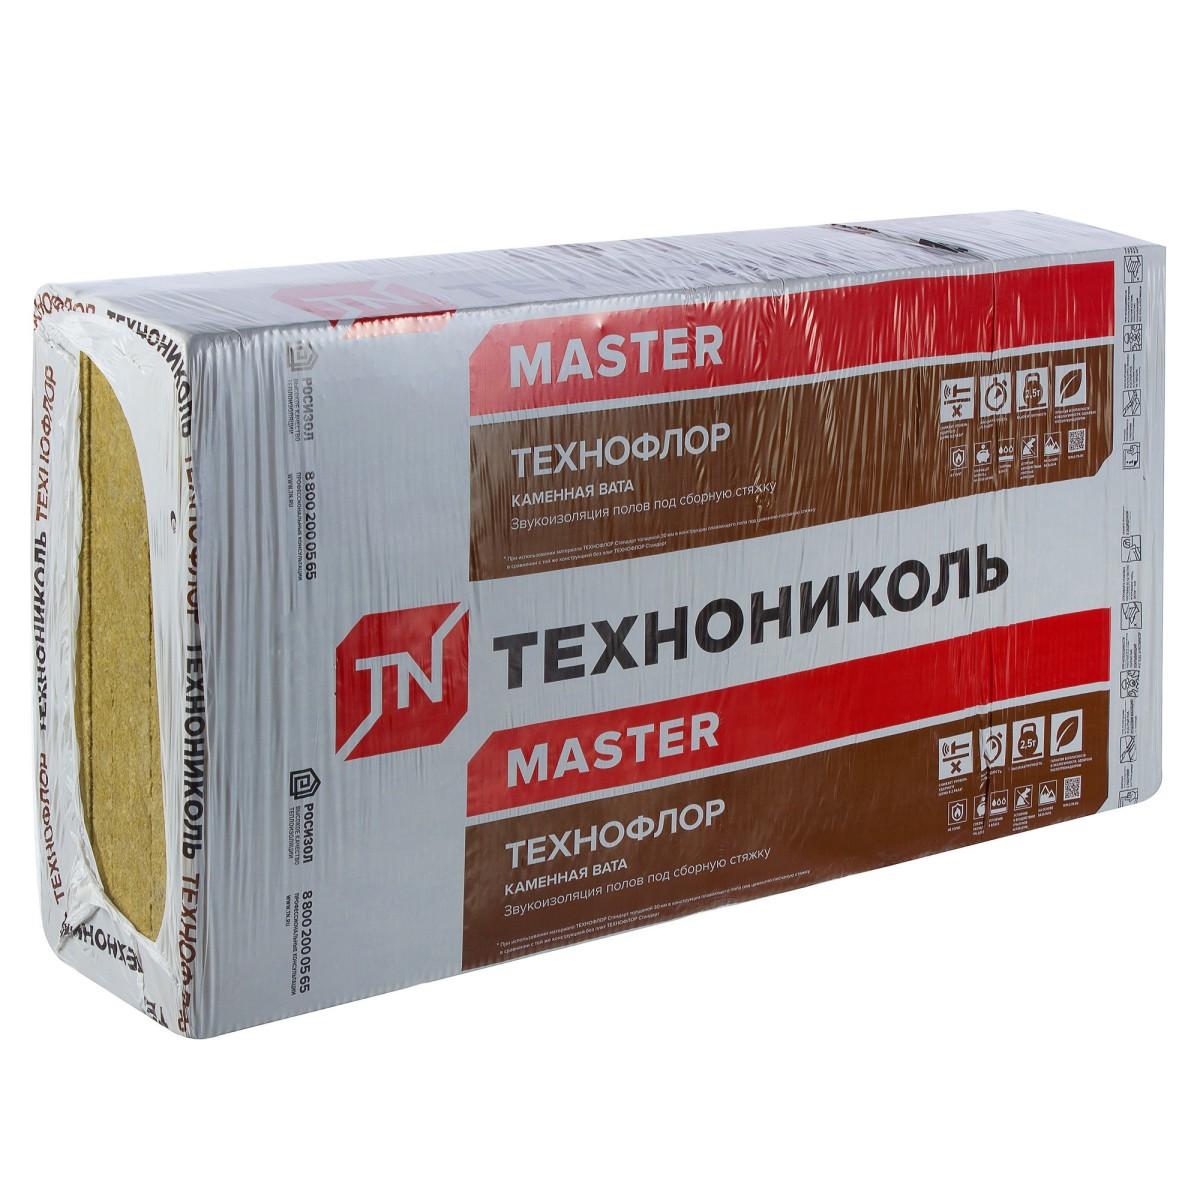 Каменная вата Технофлор стандарт 30 мм 576 м2